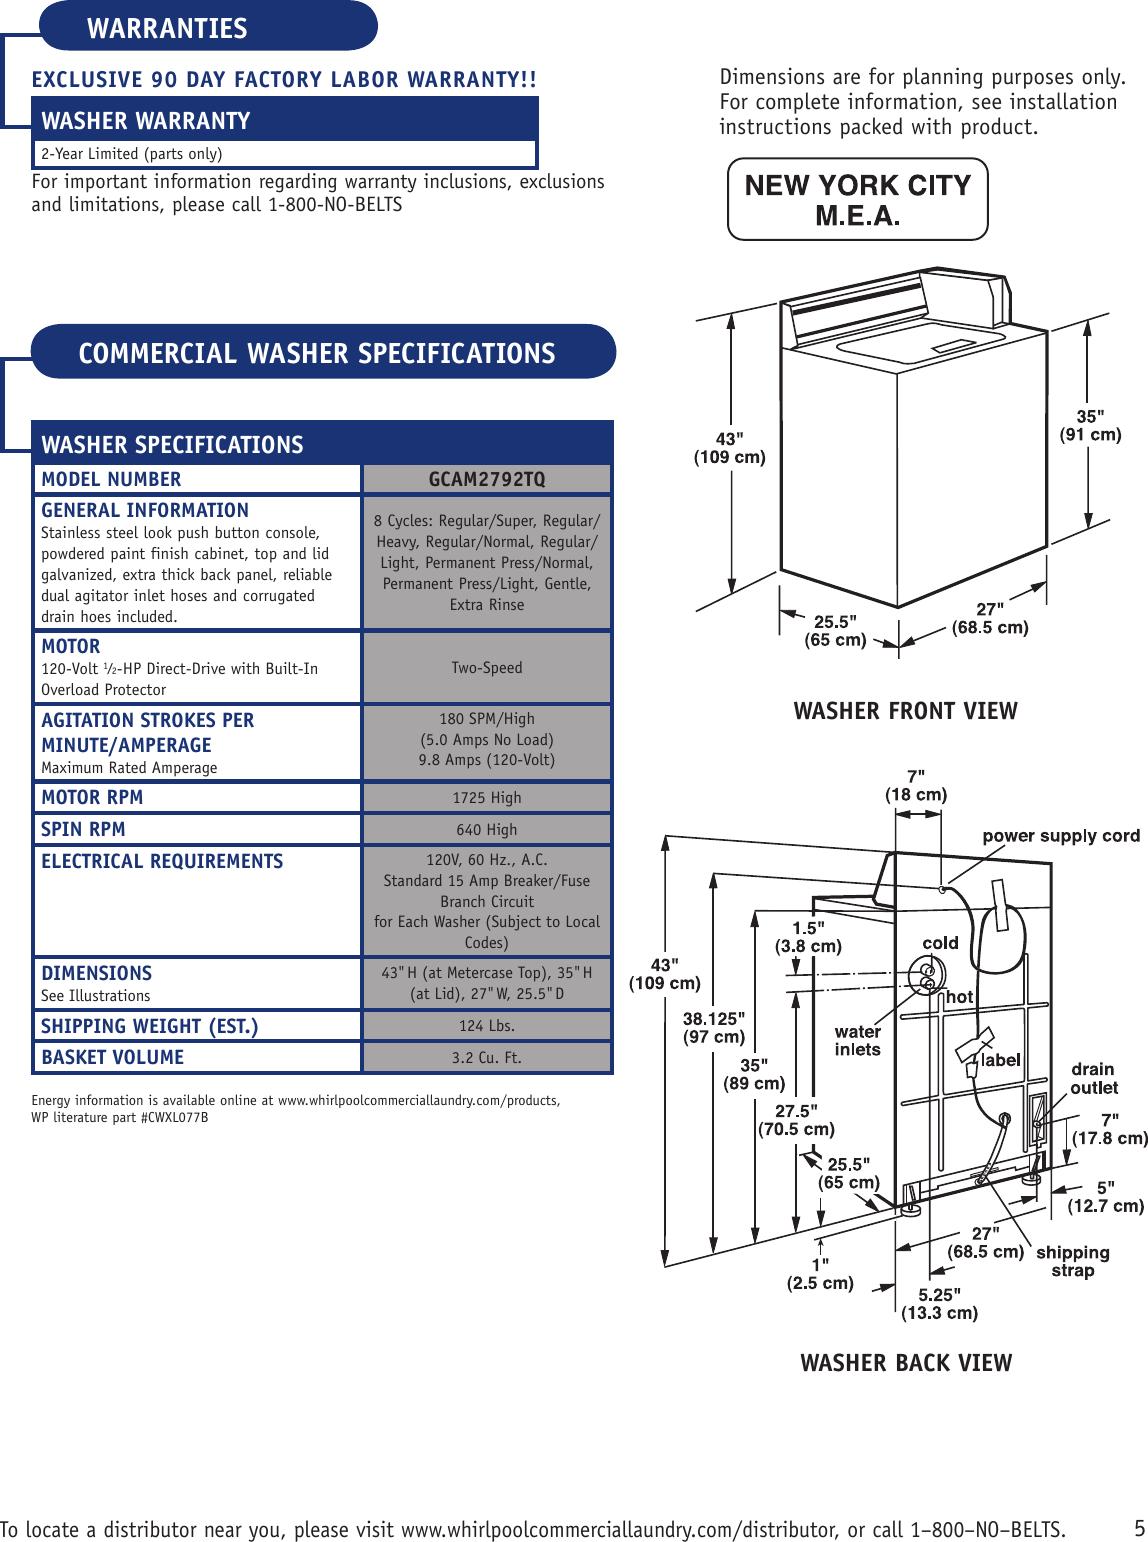 Page 2 of 2 - Whirlpool Whirlpool-Gcam2792Tq-Users-Manual-  Whirlpool-gcam2792tq-users-manual